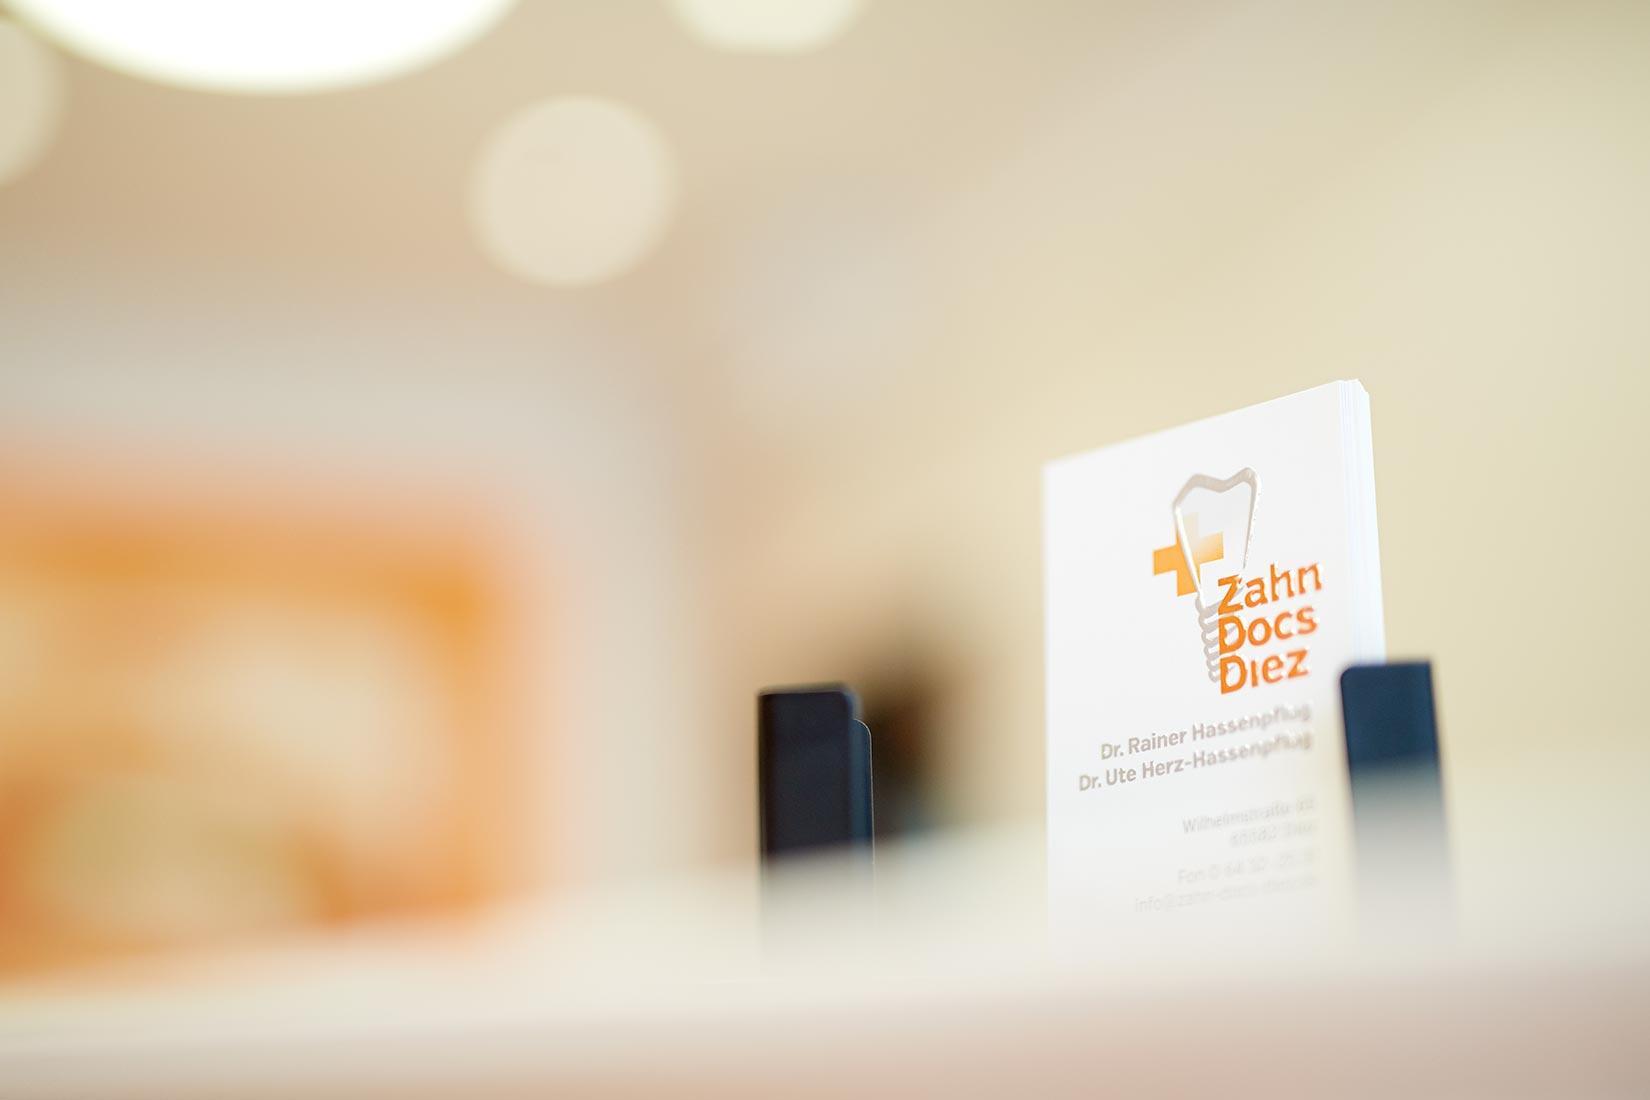 Corporate Fotografie Ambiente Zahn Docs Diez